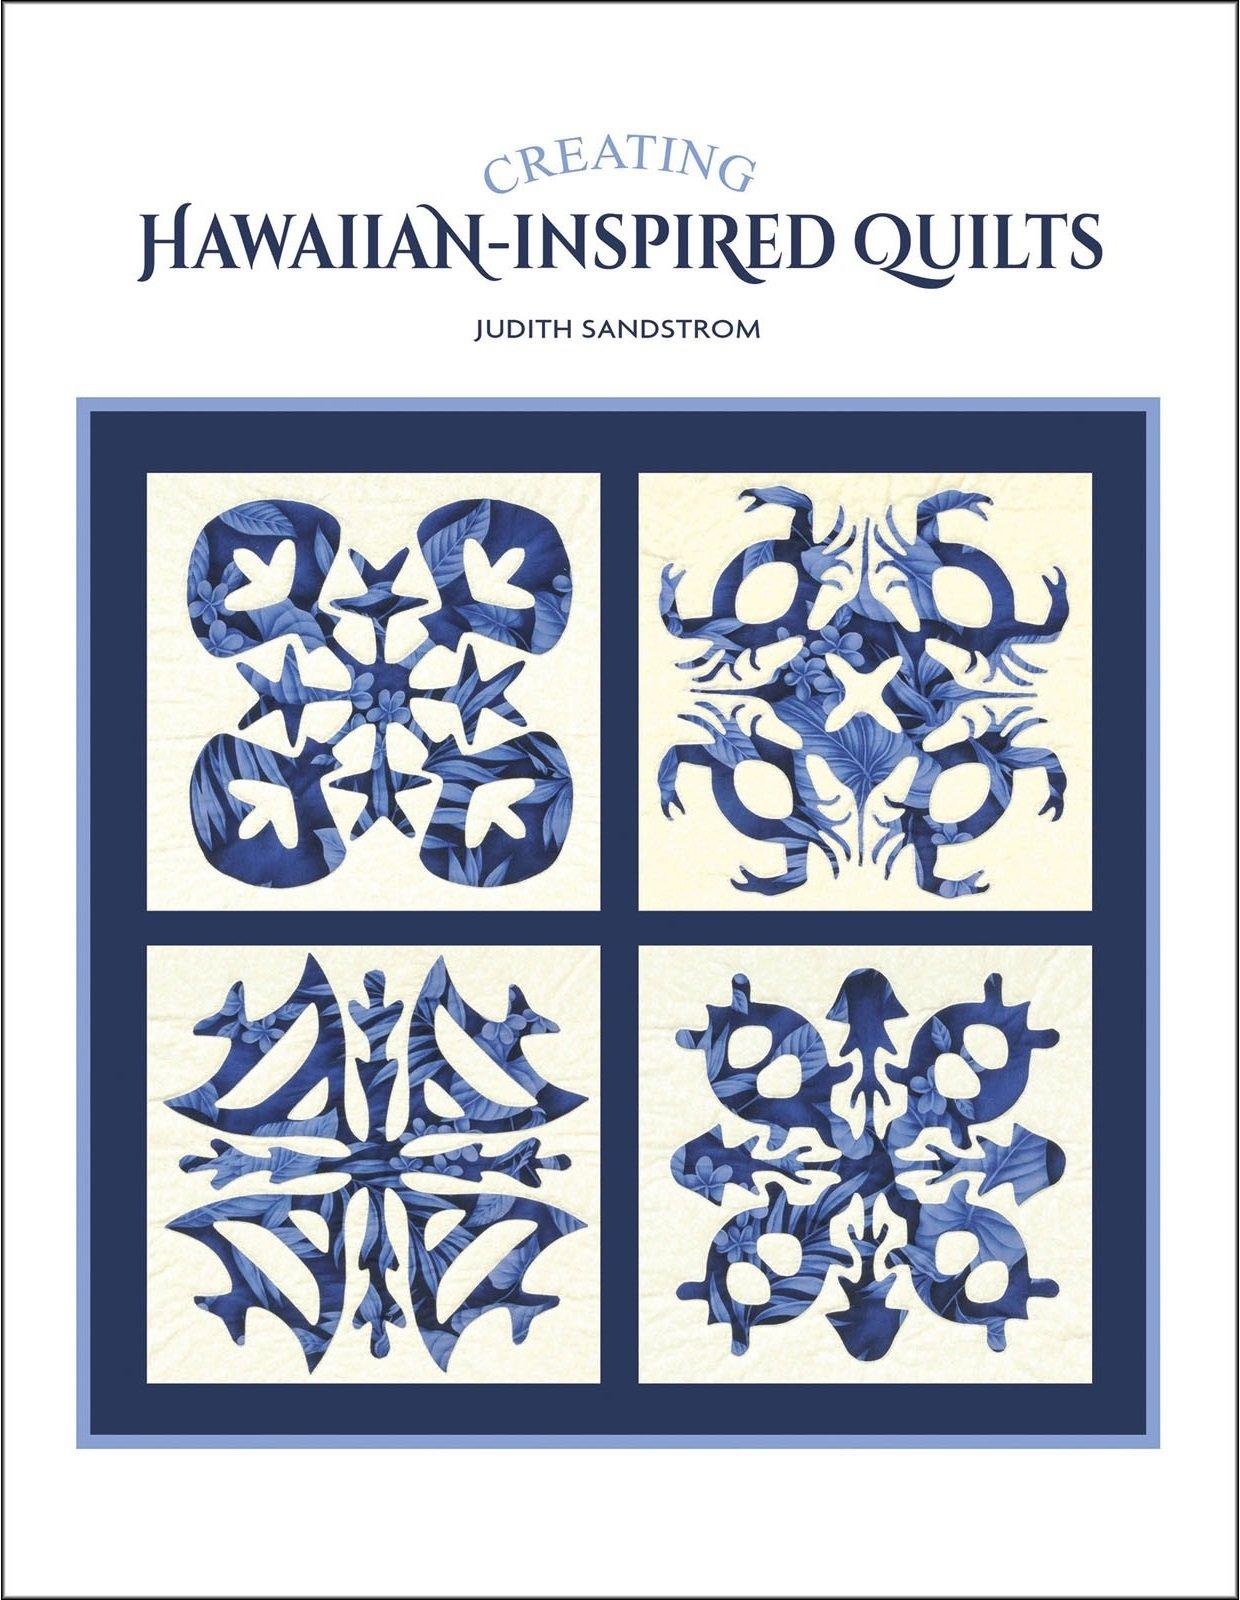 Creating Hawaiian-Inspired Quilts